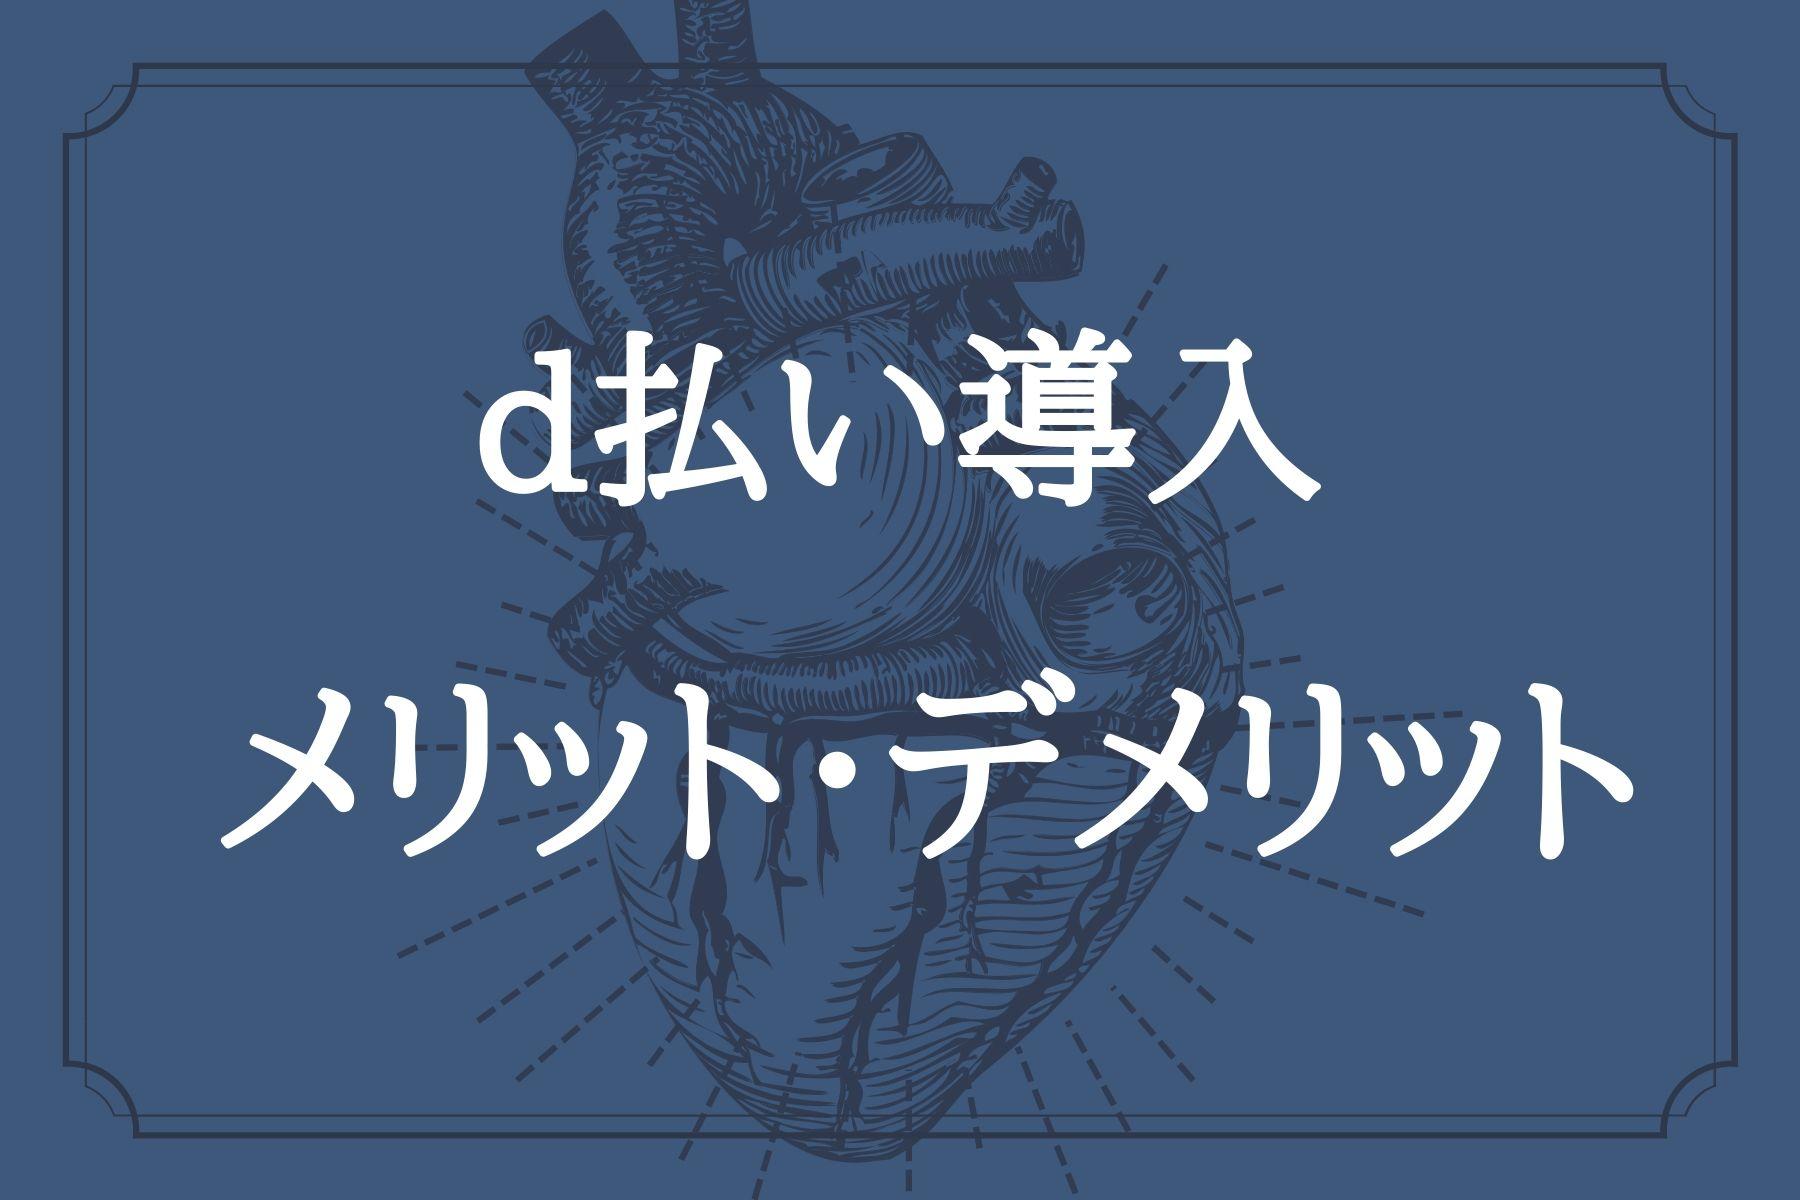 d払いを導入する5つのメリット・2つのデメリット【飲食店向け】